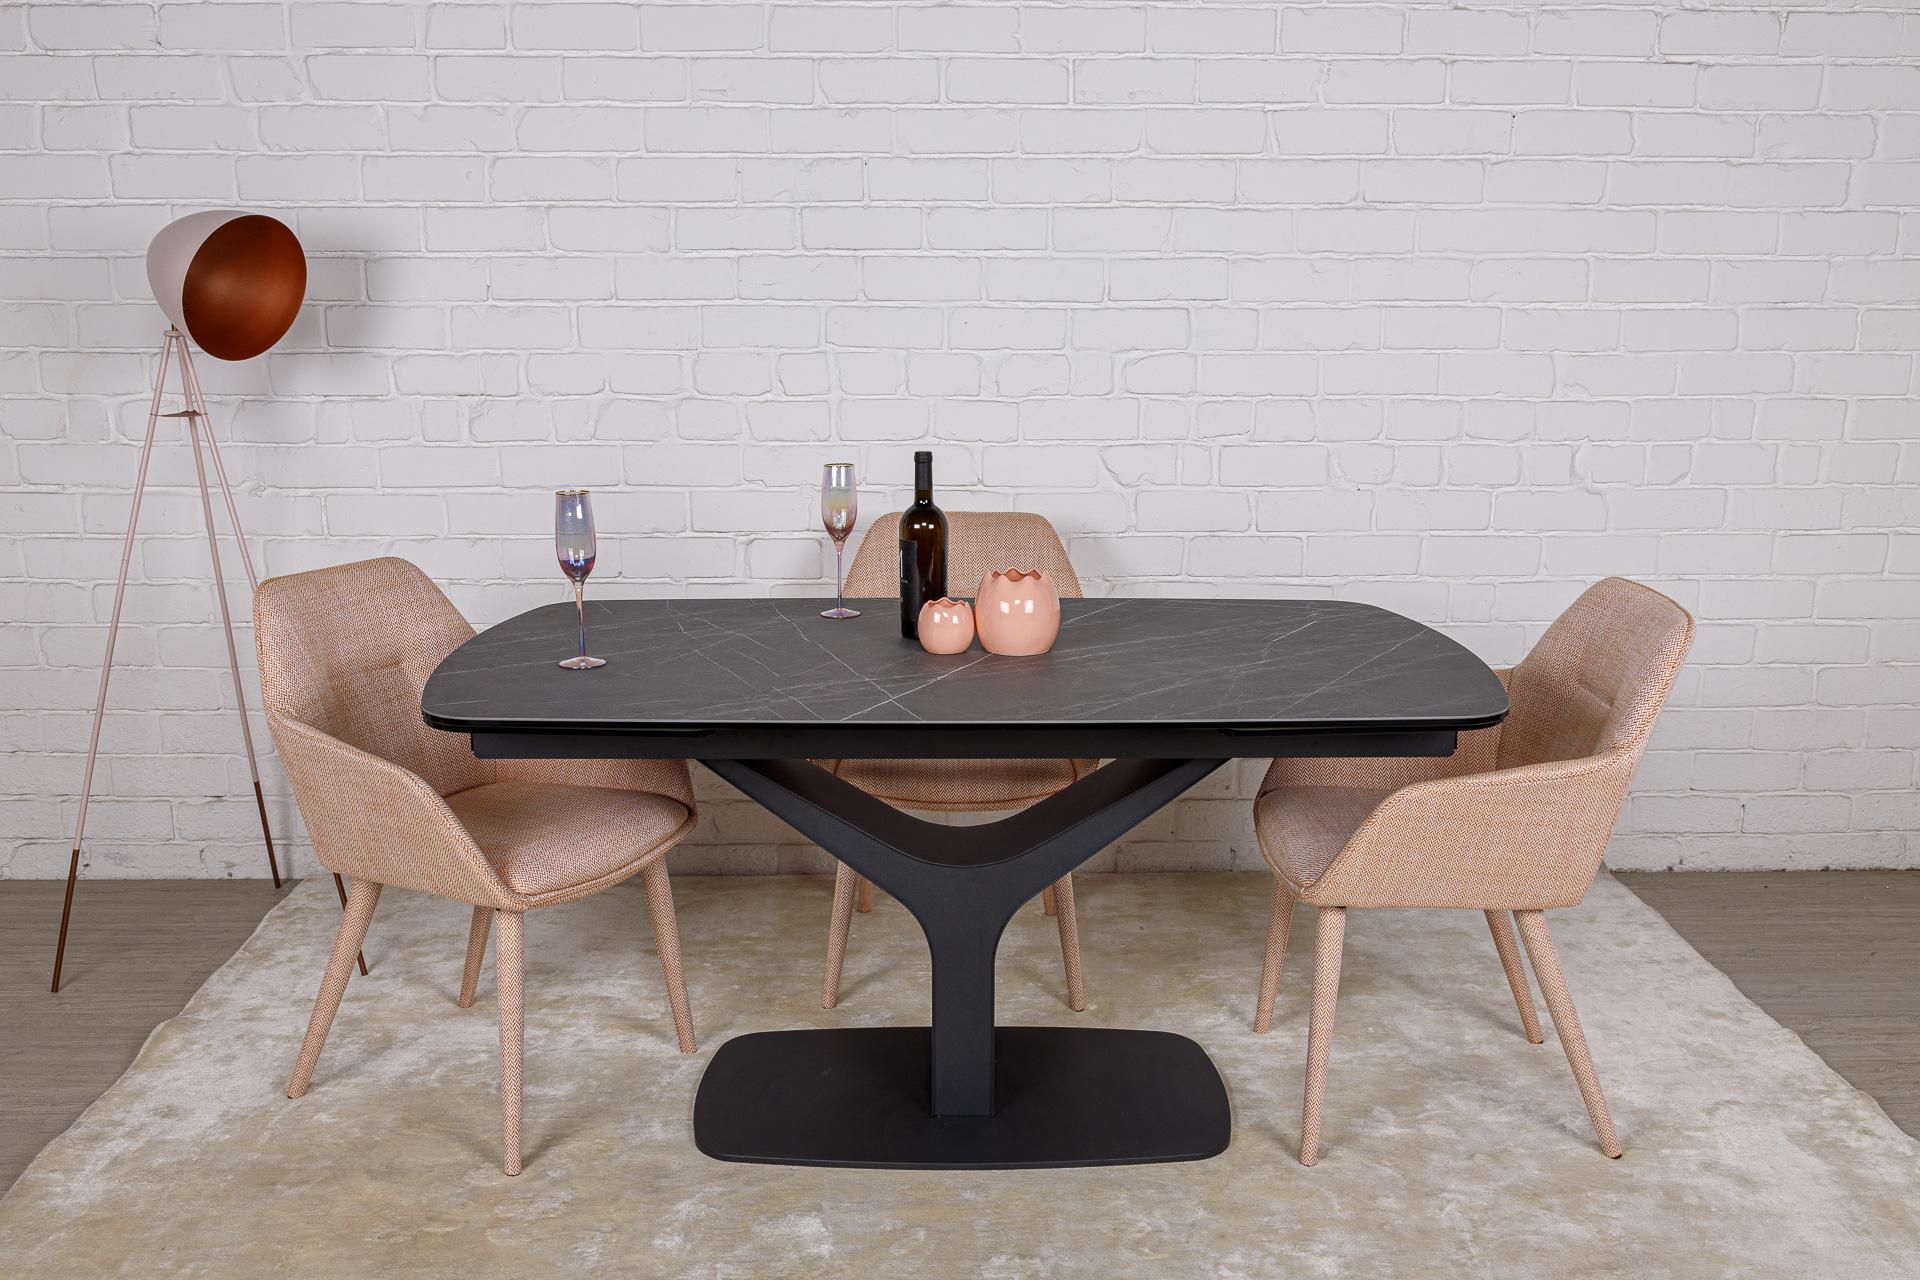 Стол Nicolas Vulcan oval HT92028 160 керамика серый антрацит